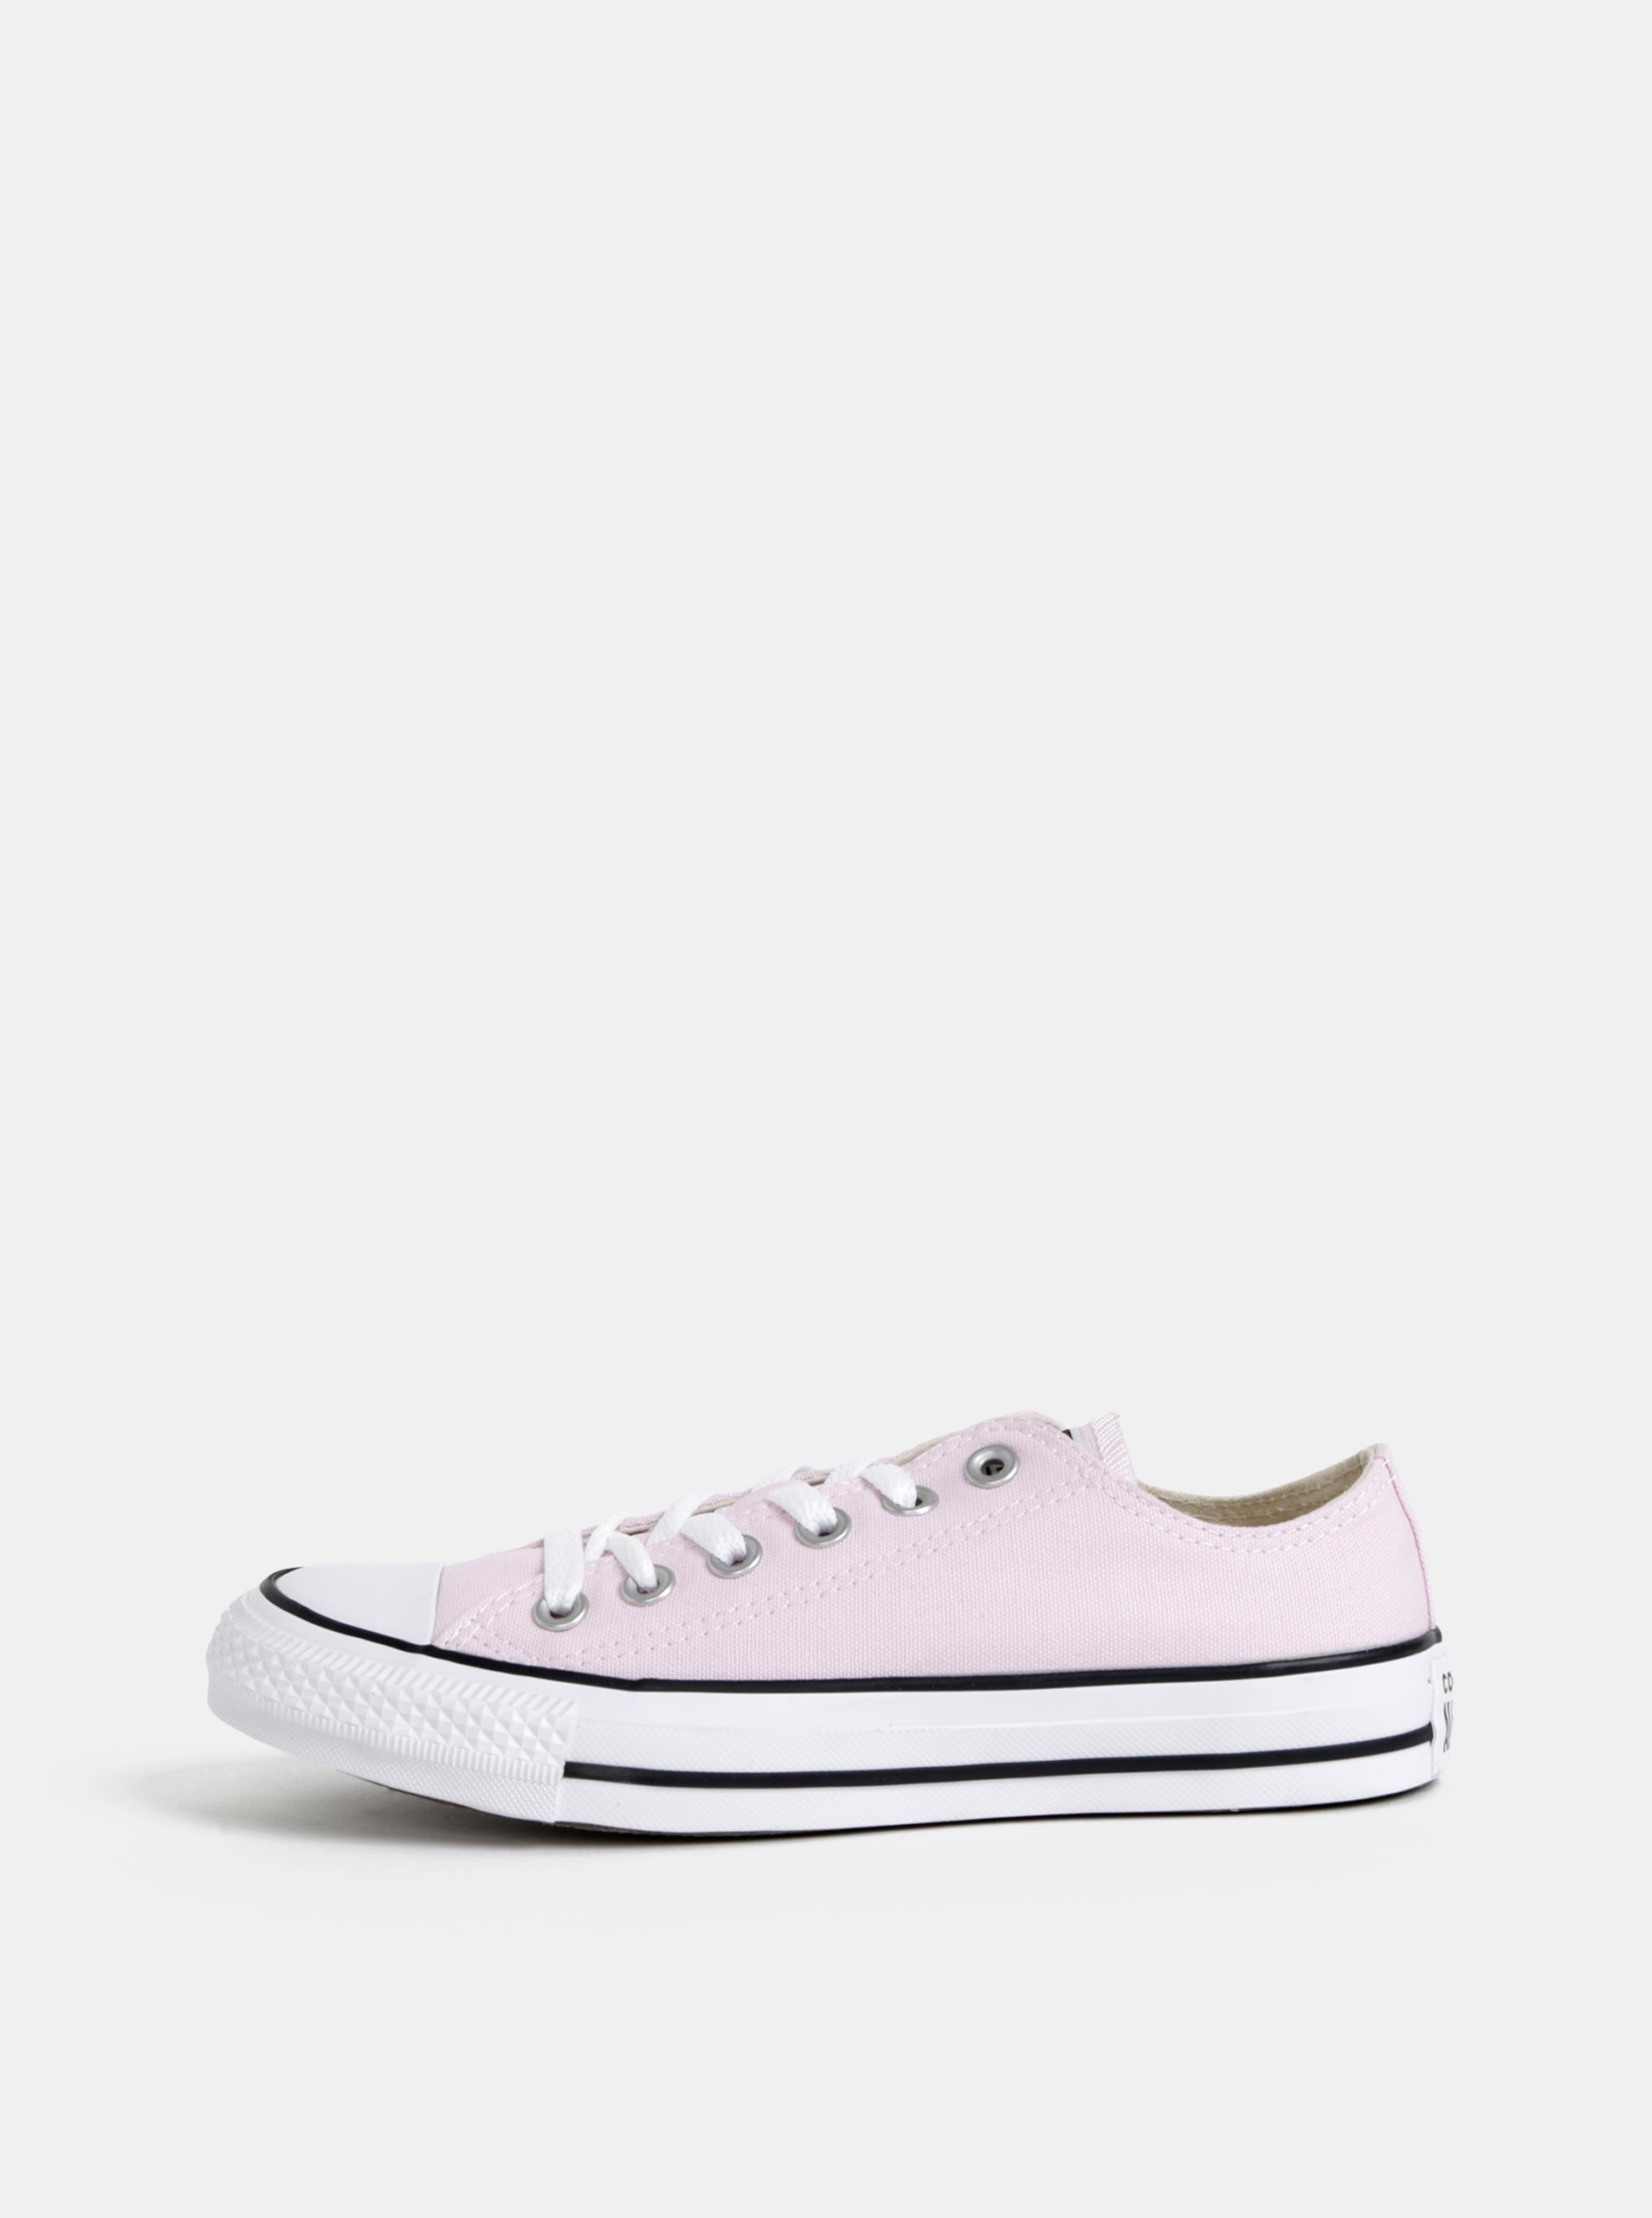 10ac7d6f3cfd Světle růžové dámské tenisky Converse Chuck Taylor All Star